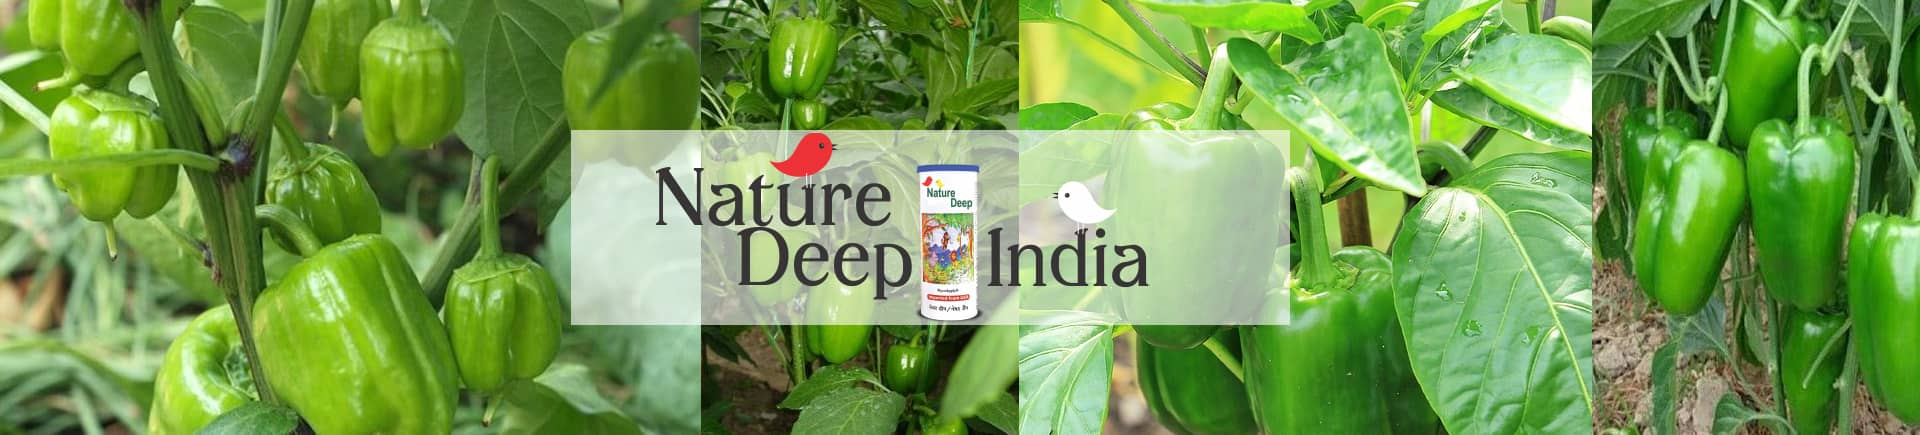 sumitomo naturedeep for capsicum crop desktop banner